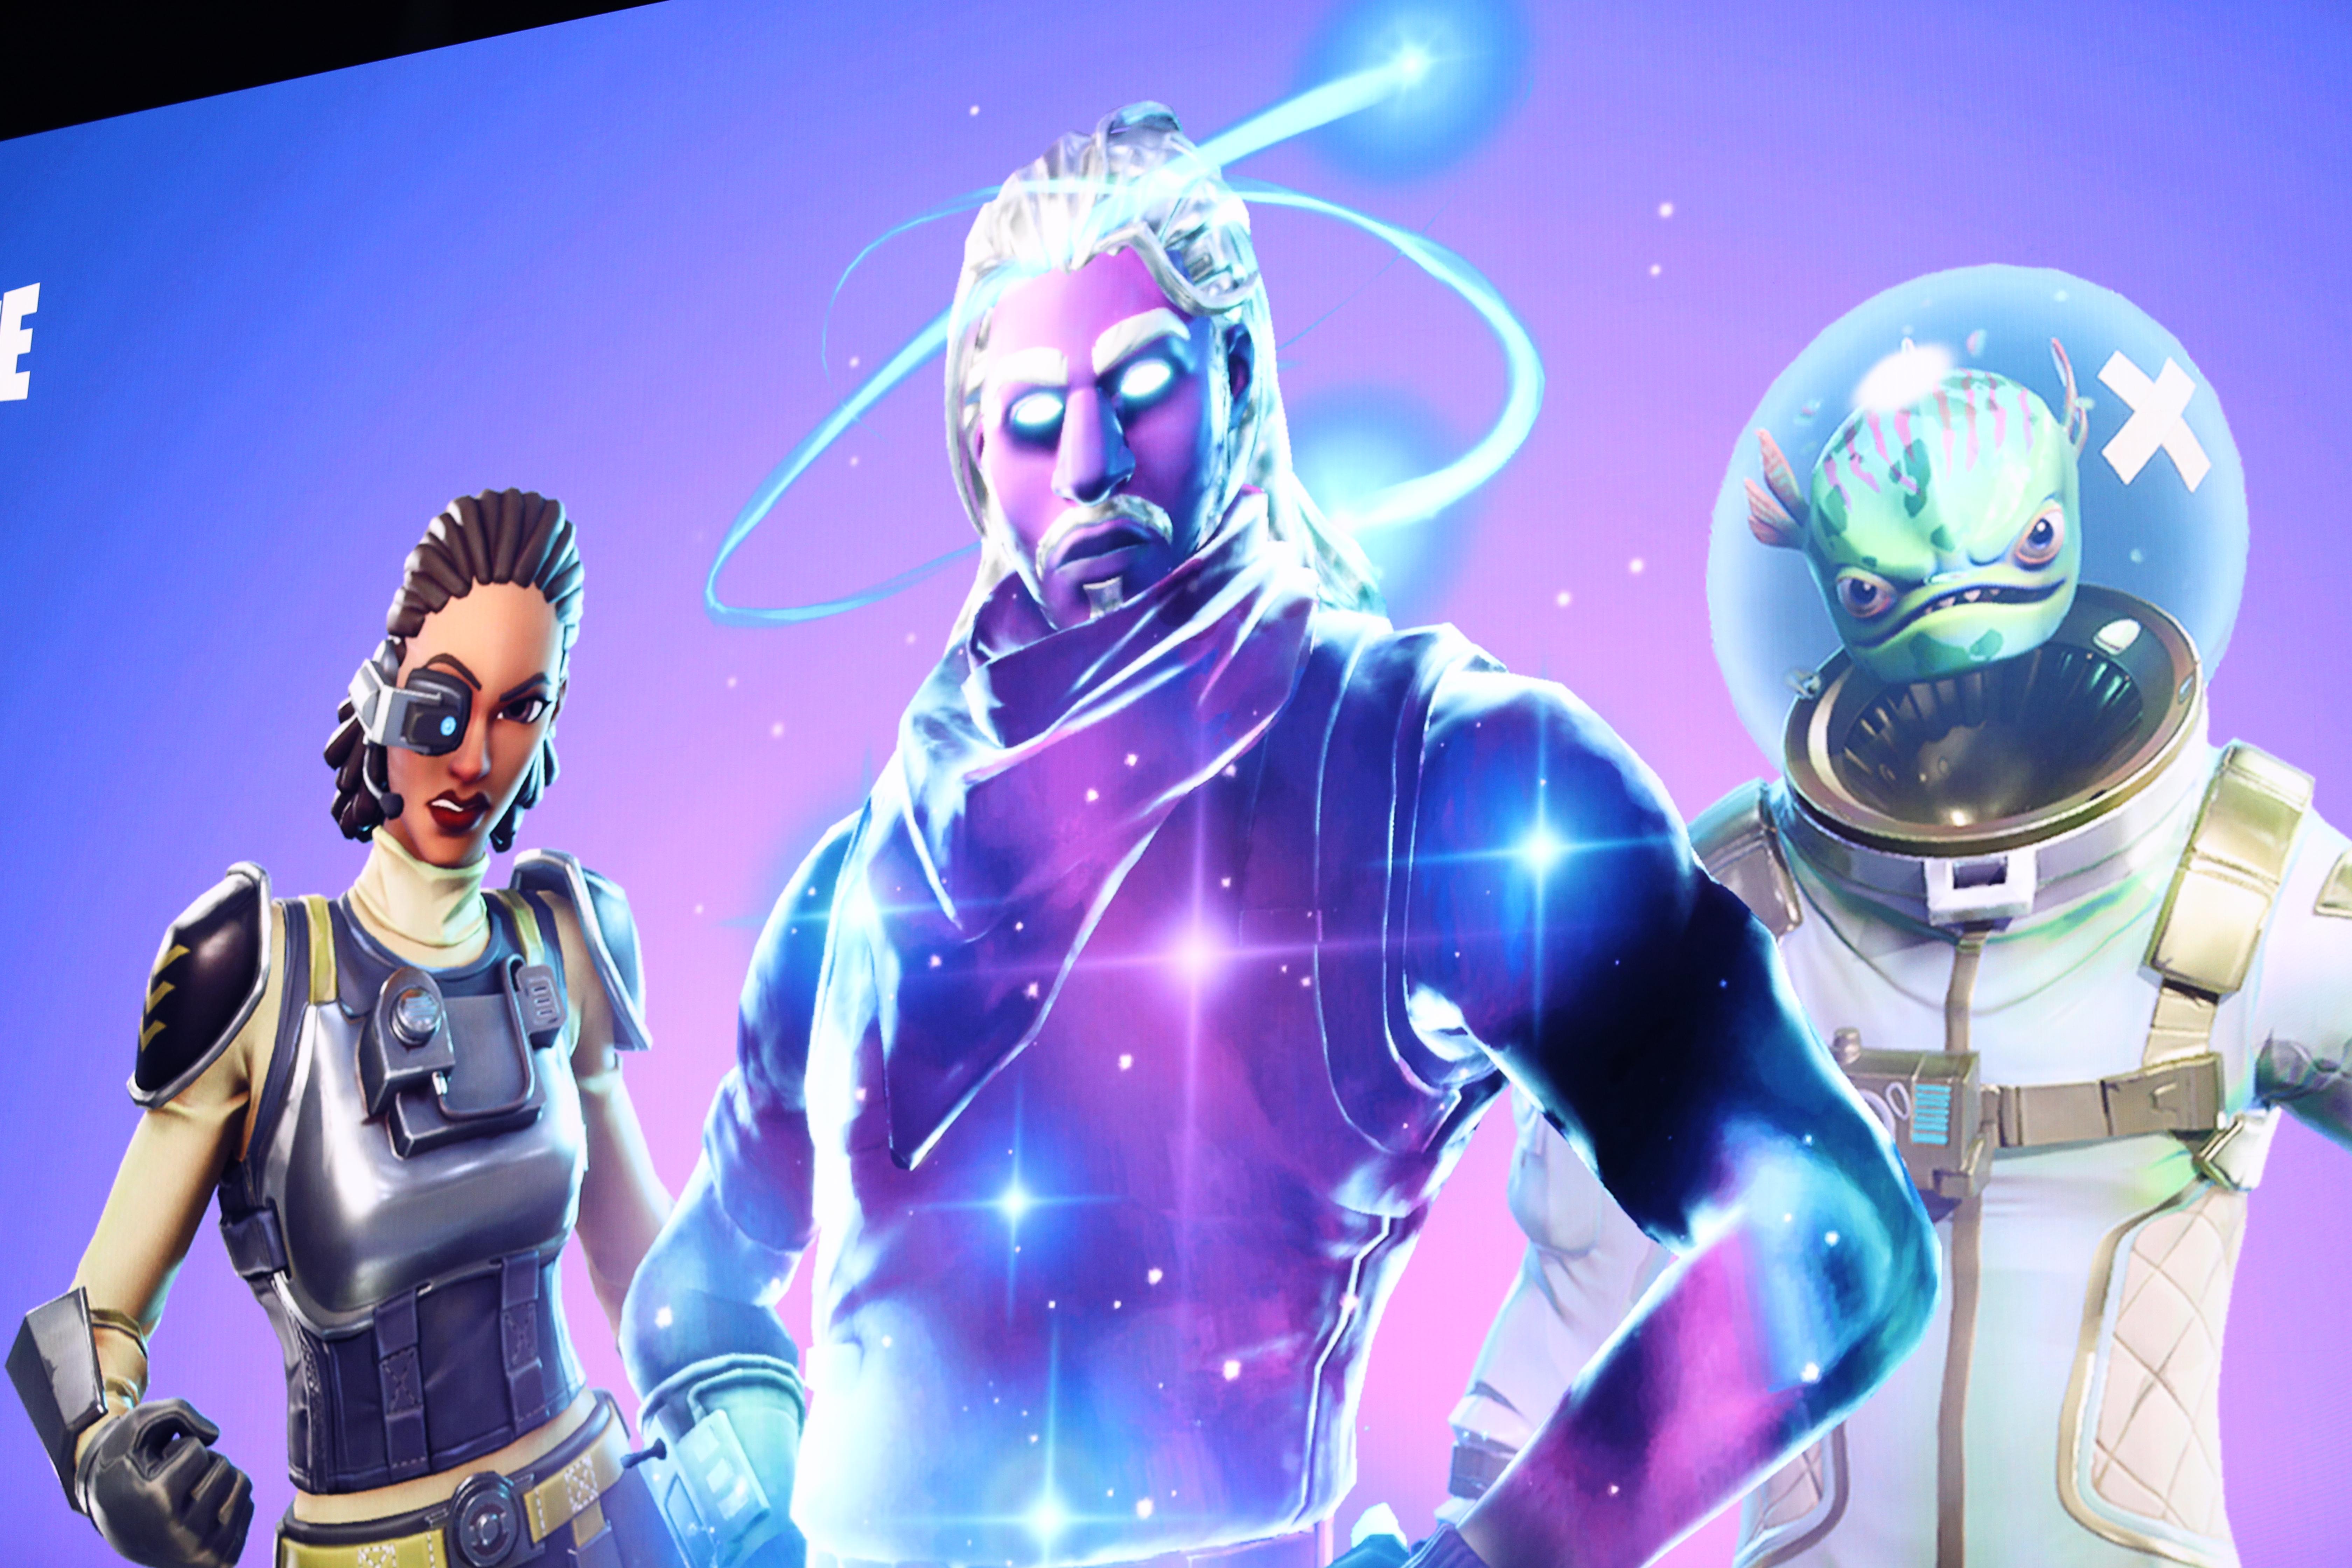 Fortnite Help Epic Games epic games, the creator of fortnite, raises $1.25 billion